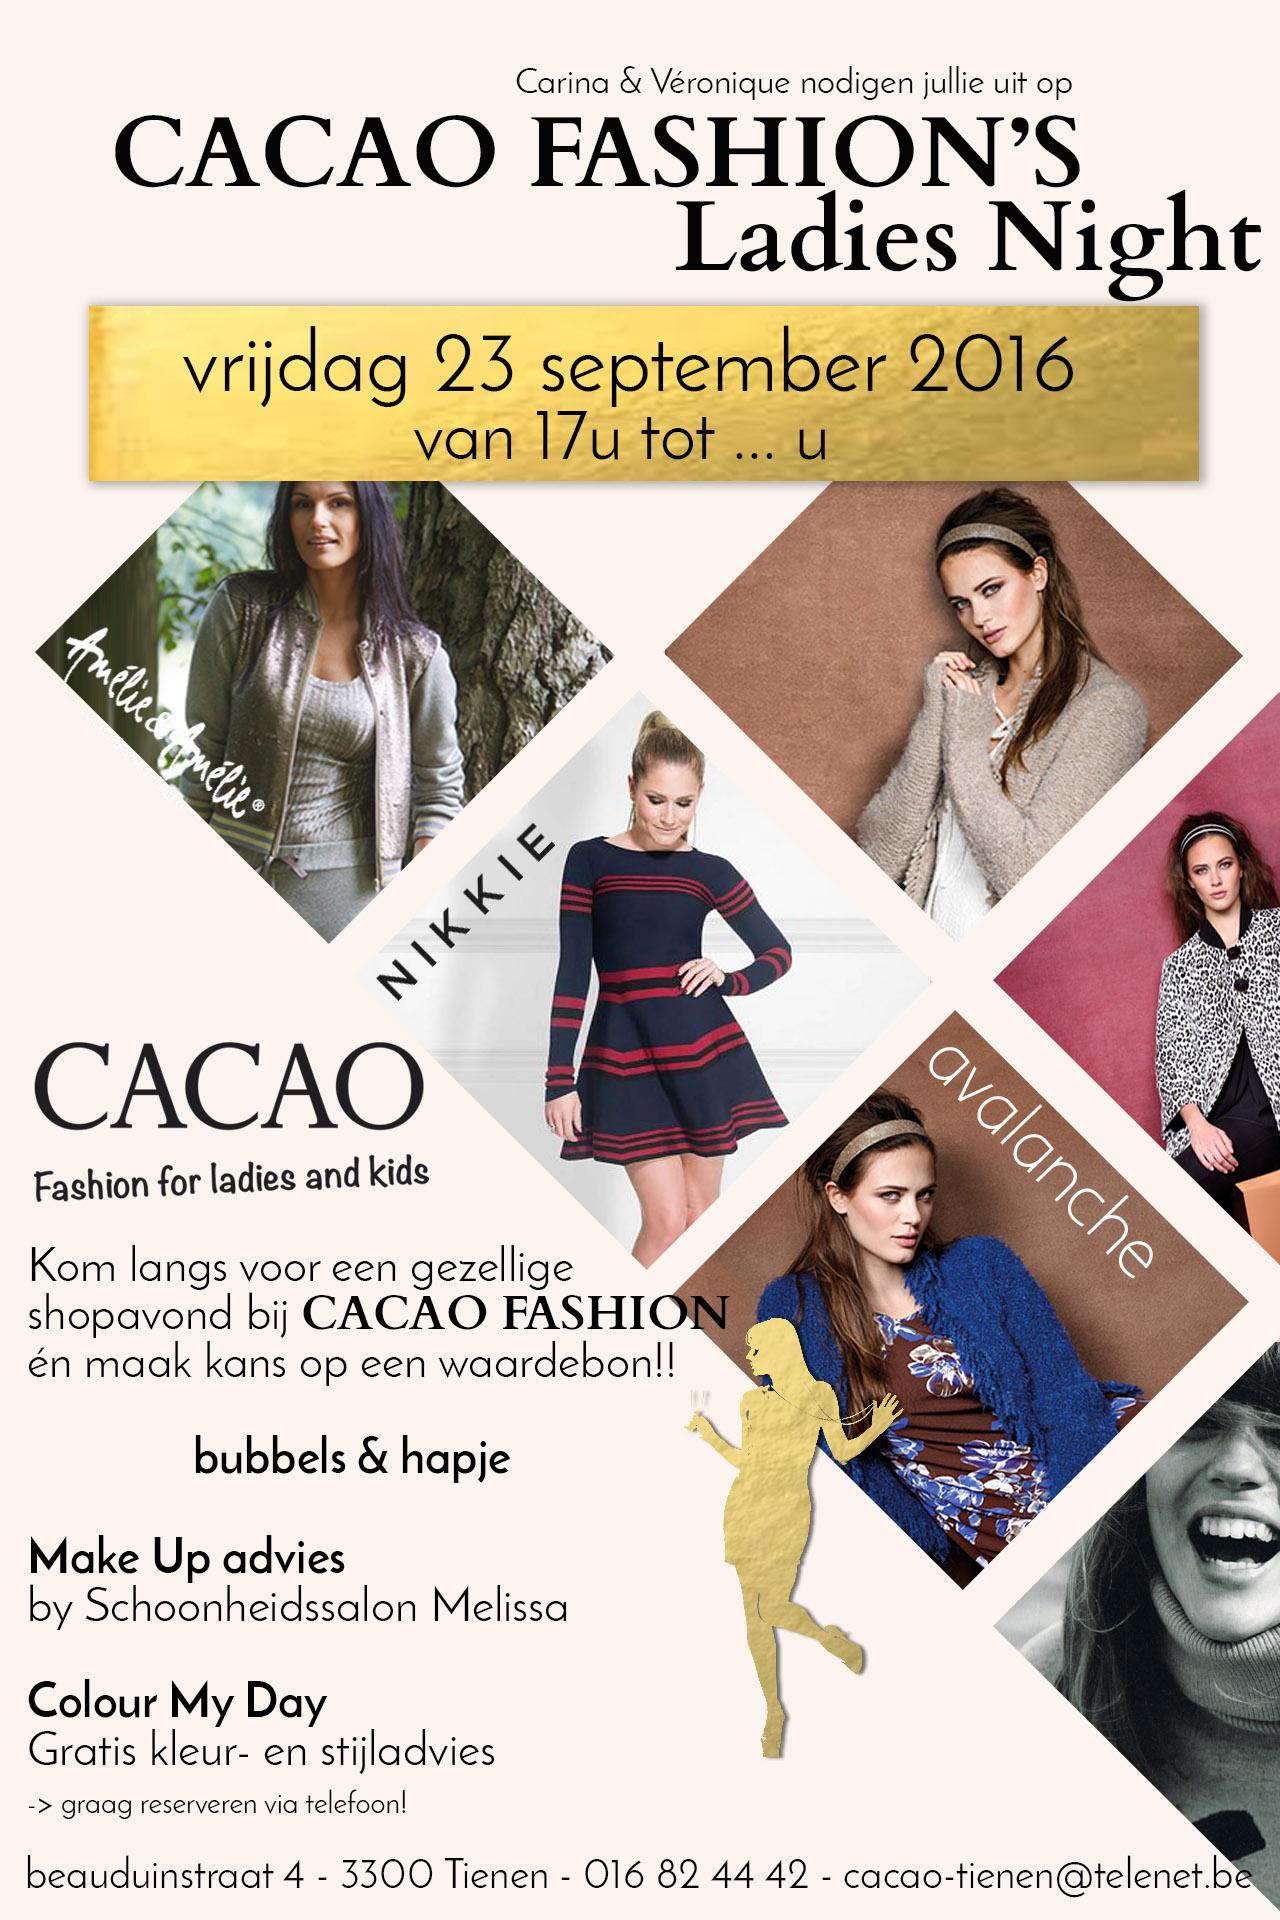 flyer-ladies-night-cacao-fashion_3-bubbels-en-hapje